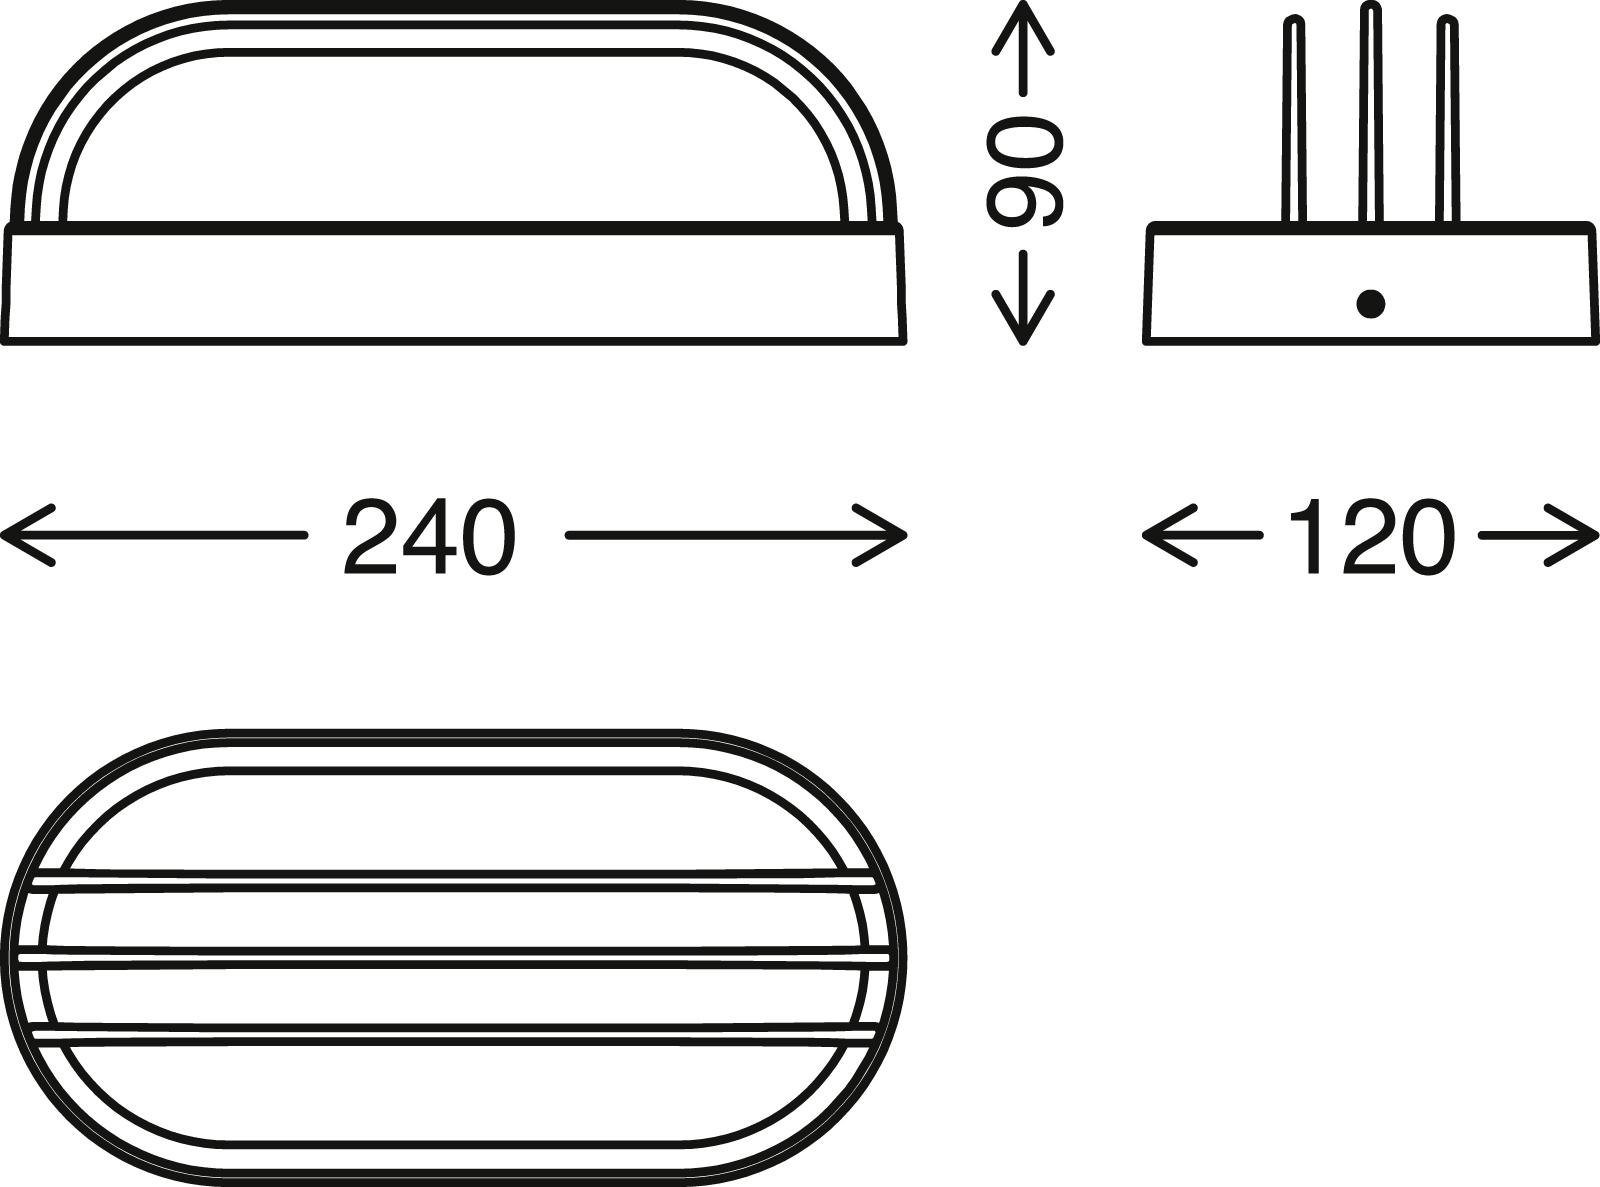 TELEFUNKEN LED Aussenwandleuchte, 24 cm, 12 W, Schwarz